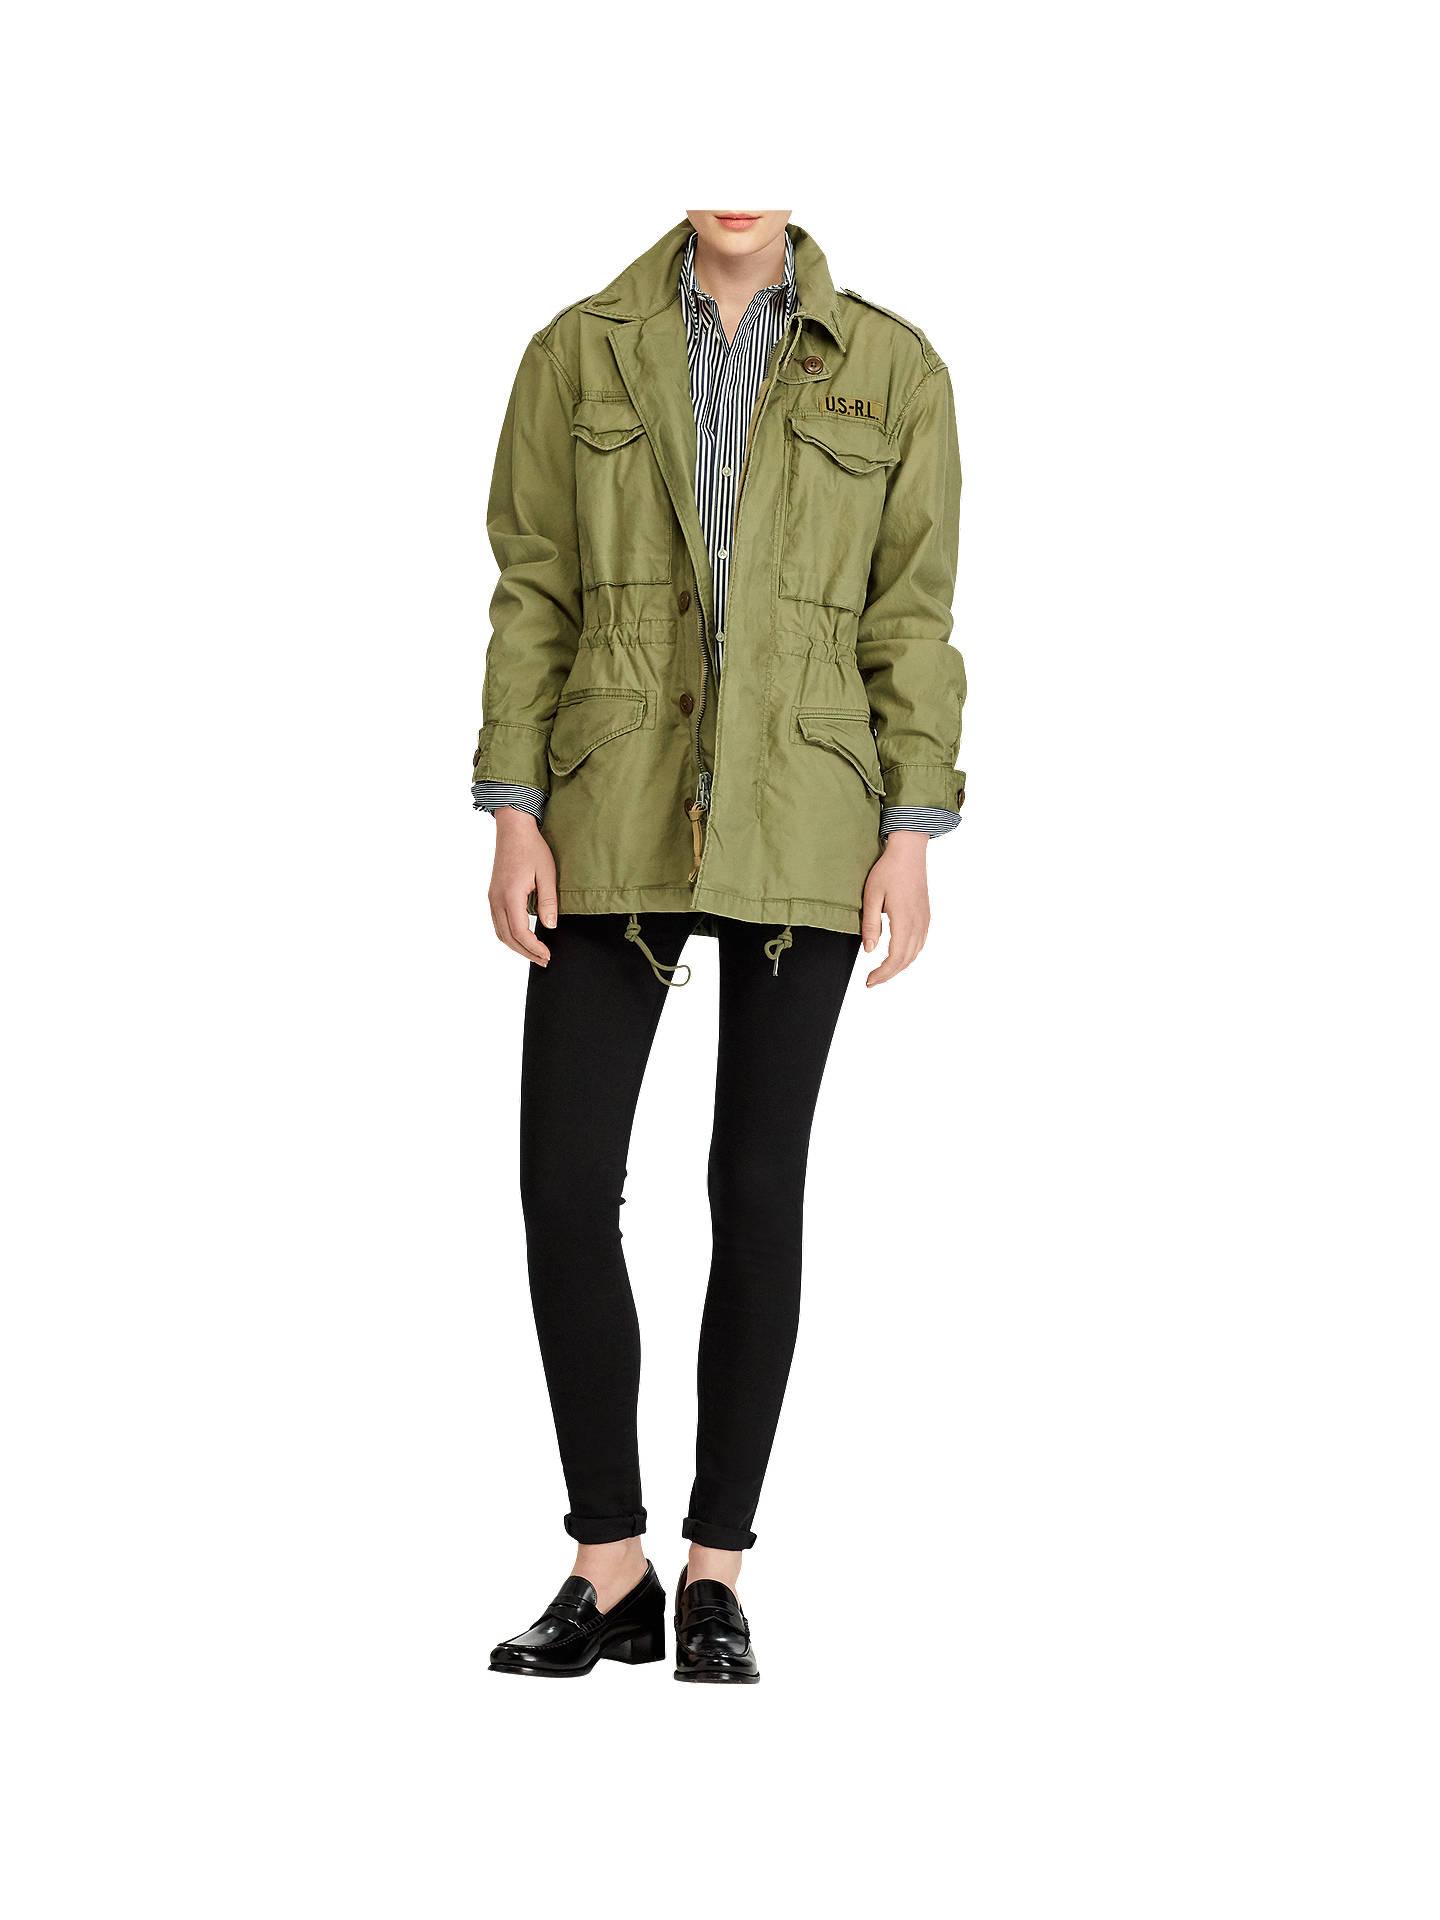 4e3eba013 Buy Polo Ralph Lauren Cotton Twill Jacket